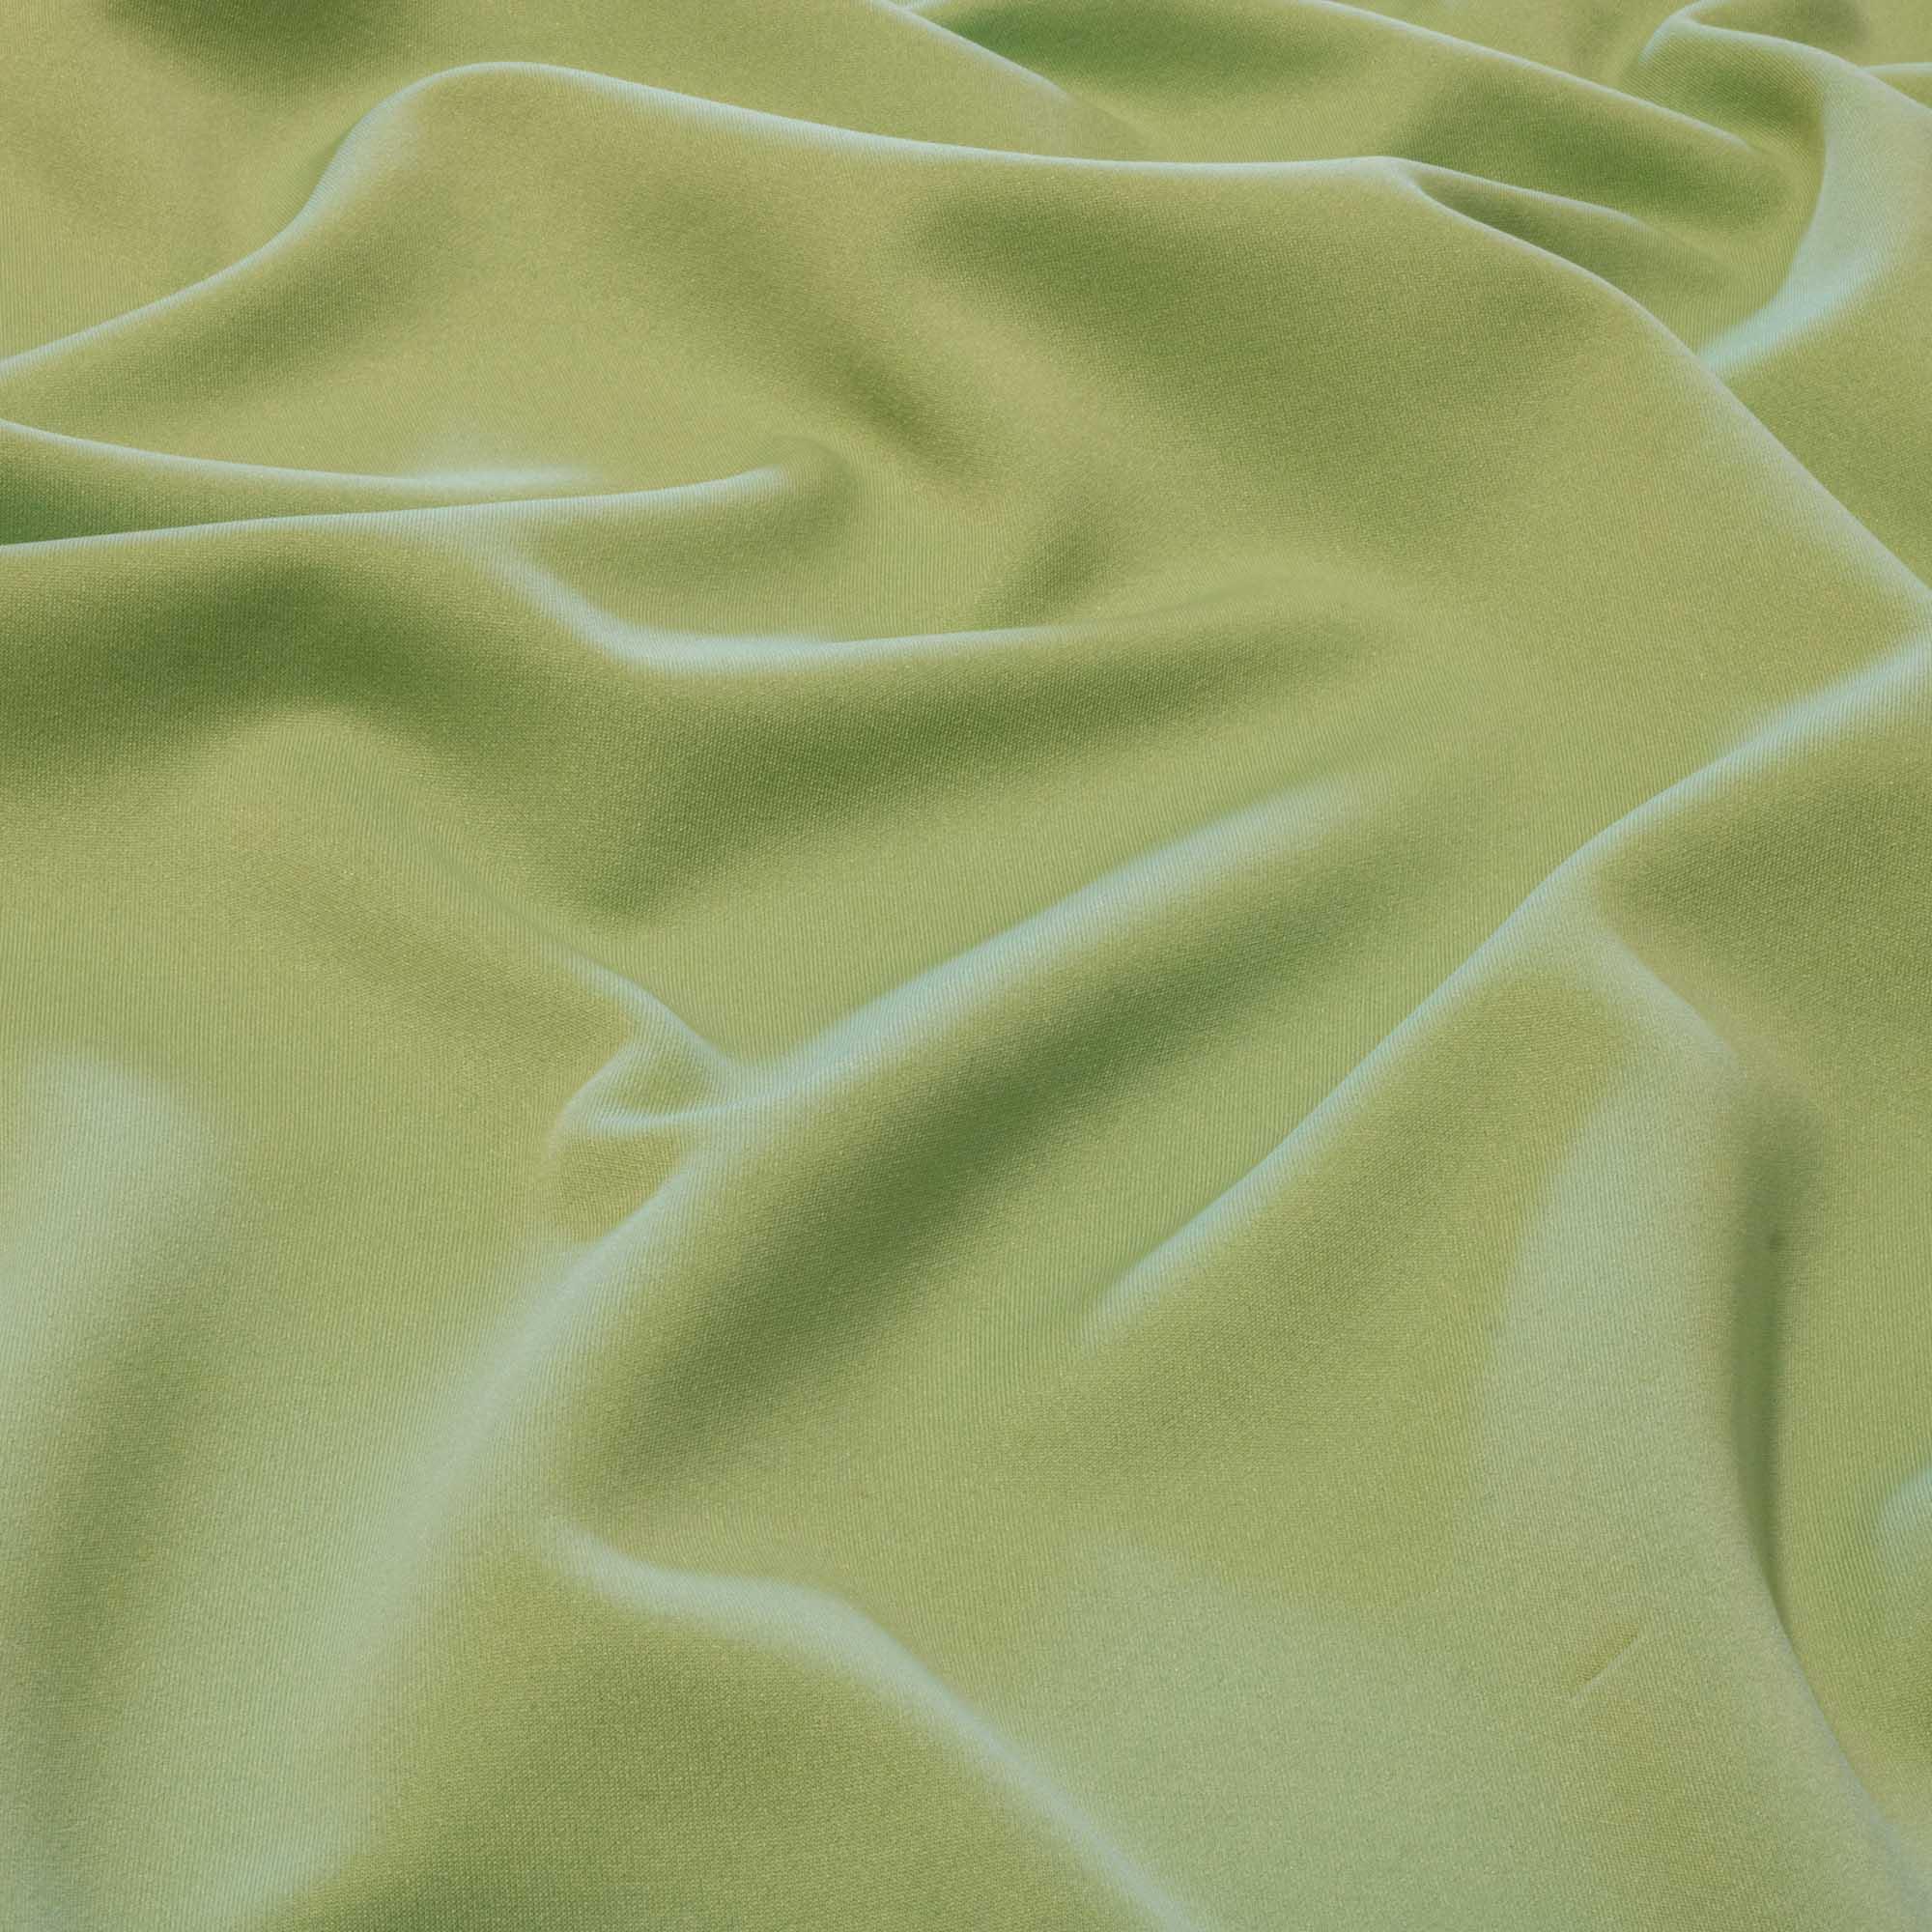 Tecido Malha Neoprene 95% Poliester 5% Elastano Verde Água